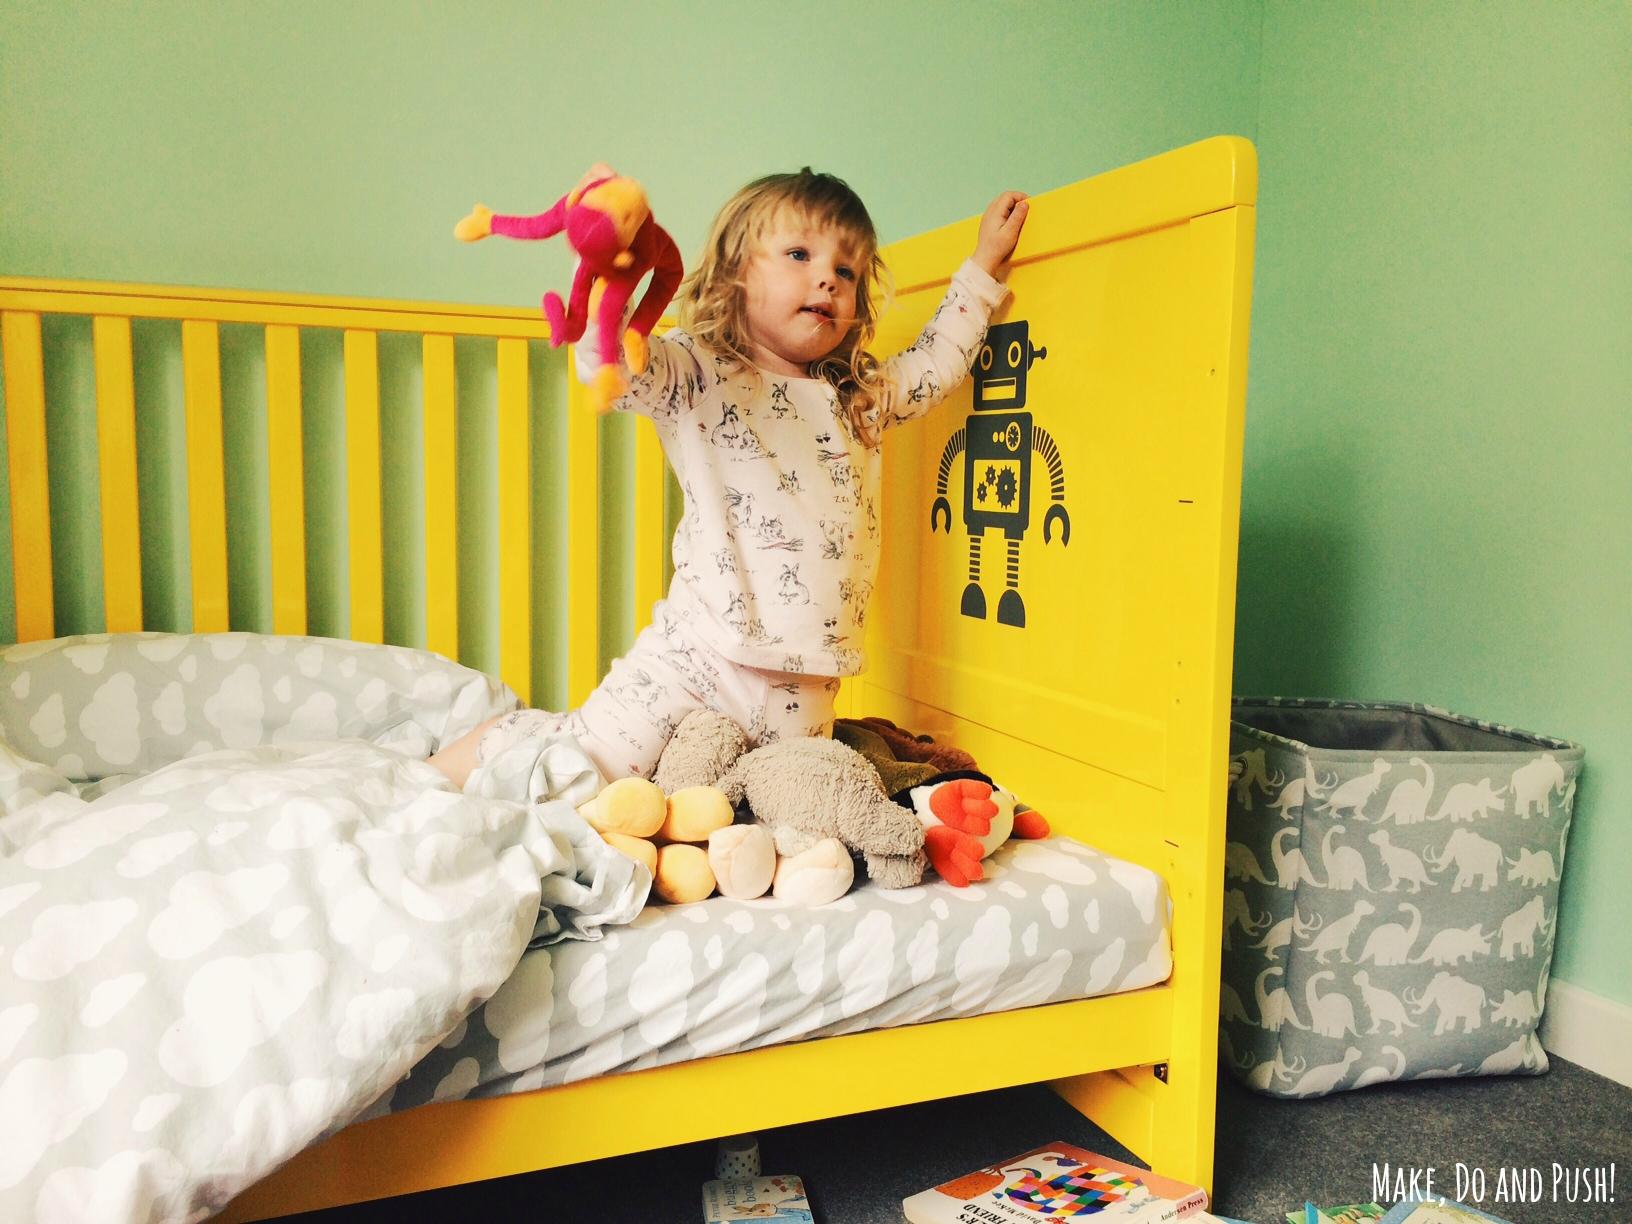 фото кровати-трансформера Cosatto Story